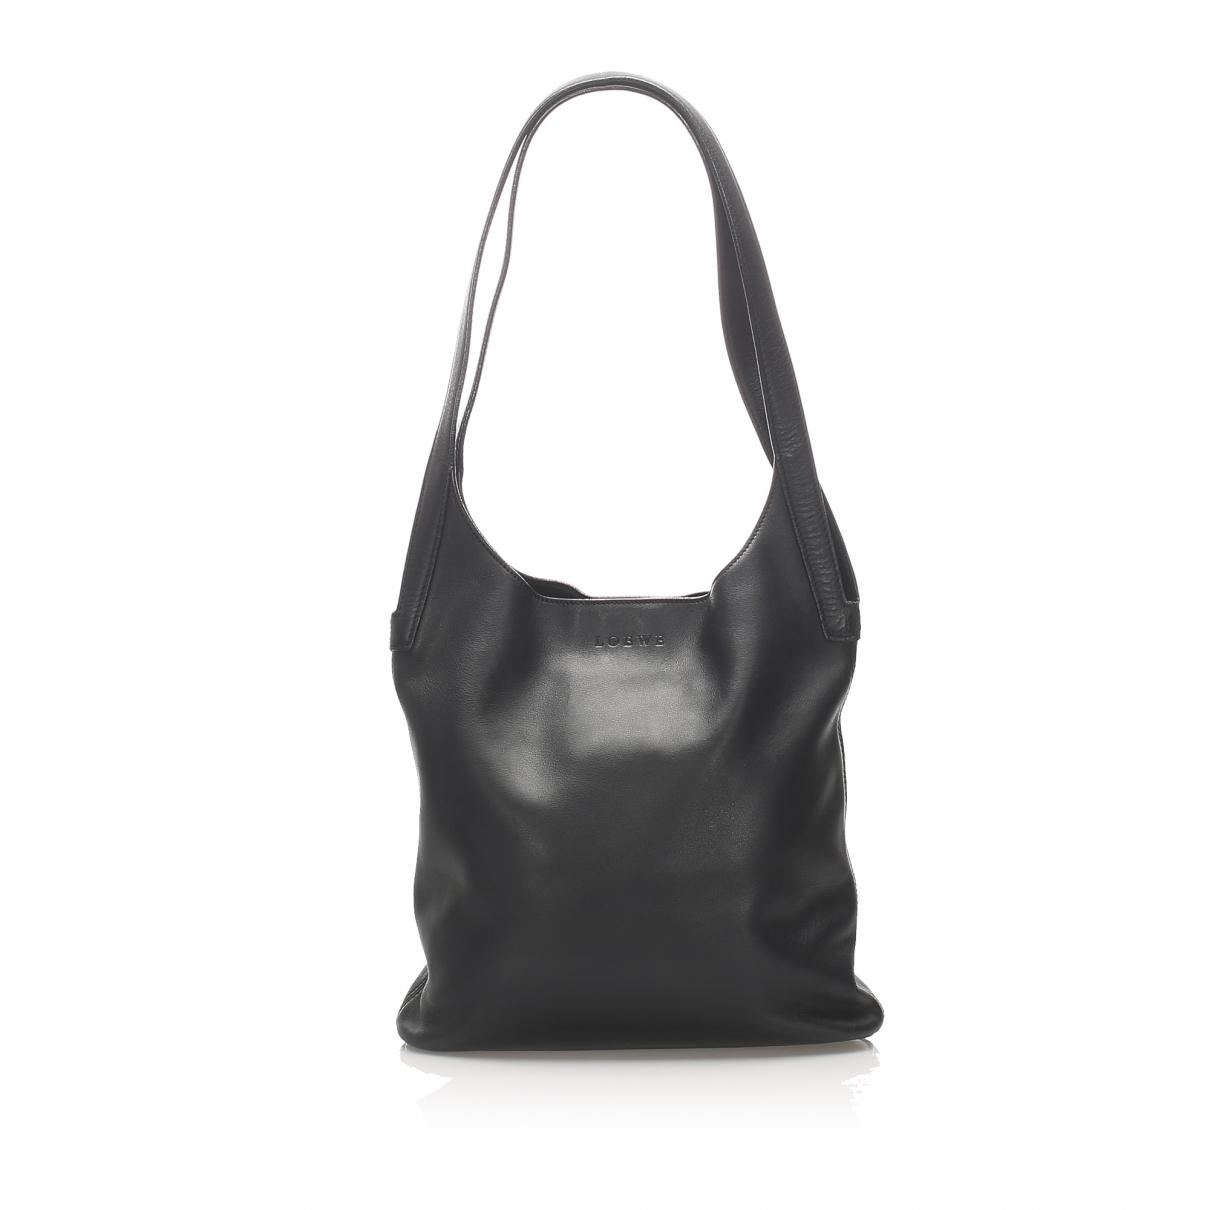 Loewe - Sac a main   pour femme en cuir - noir